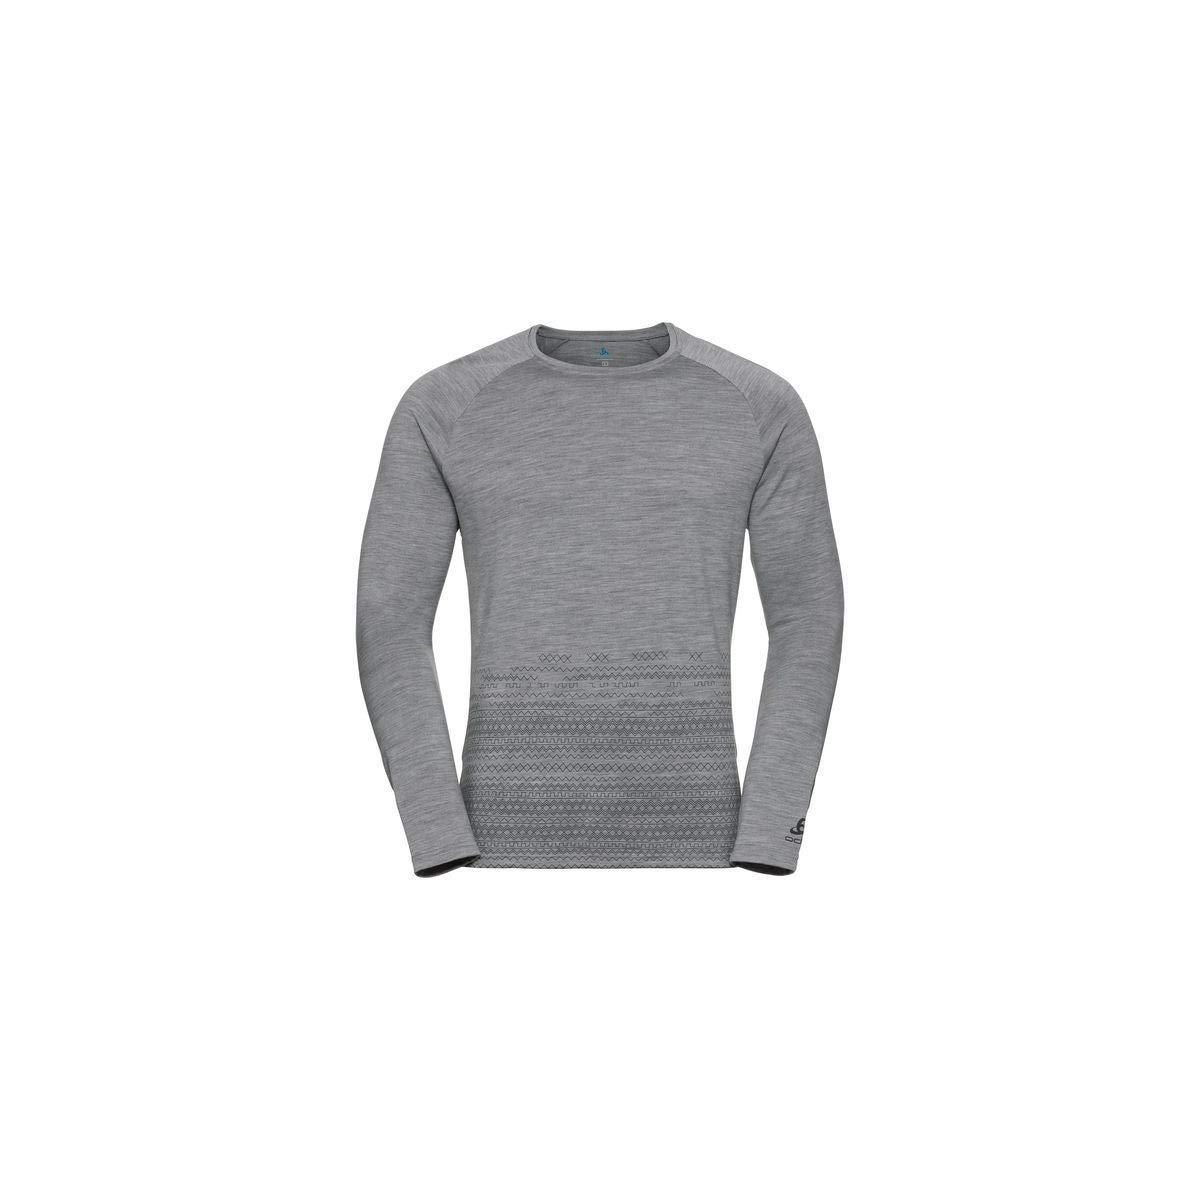 Odlo Alliance Crew Neck Shirt - Grey Melange/Geometric Print FW19